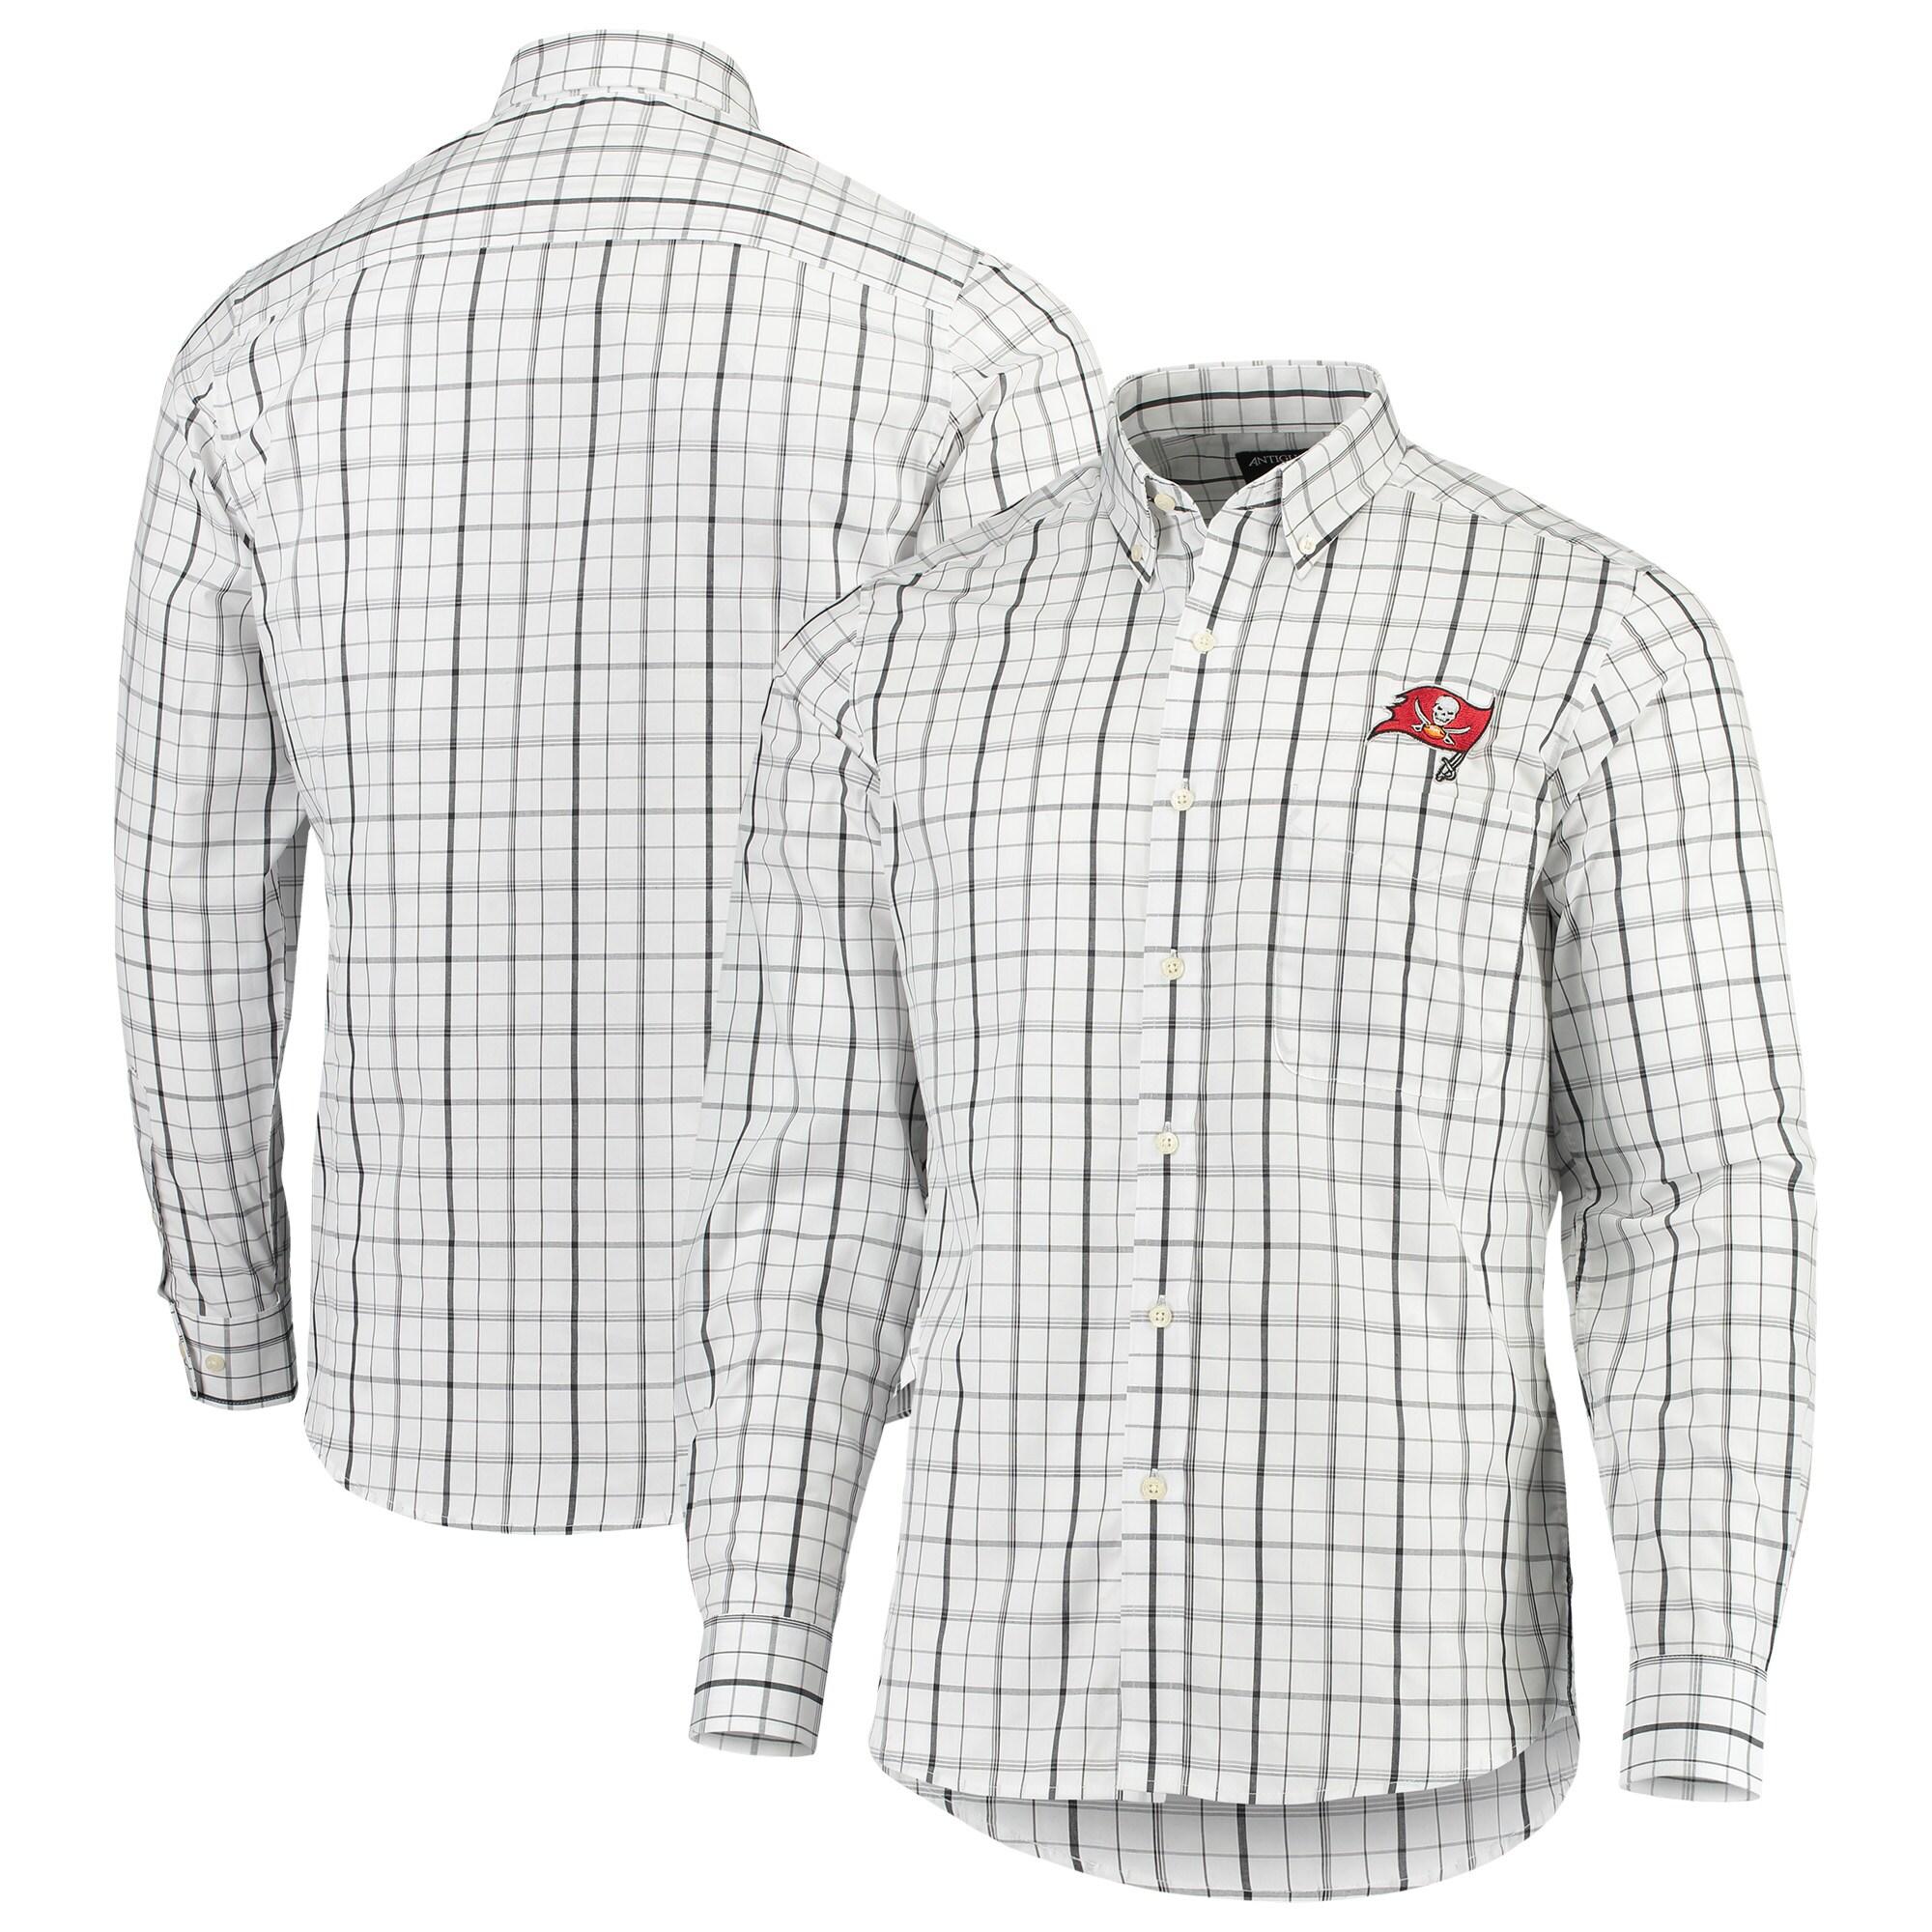 Tampa Bay Buccaneers Antigua Keen Long Sleeve Button-Down Shirt - White/Black